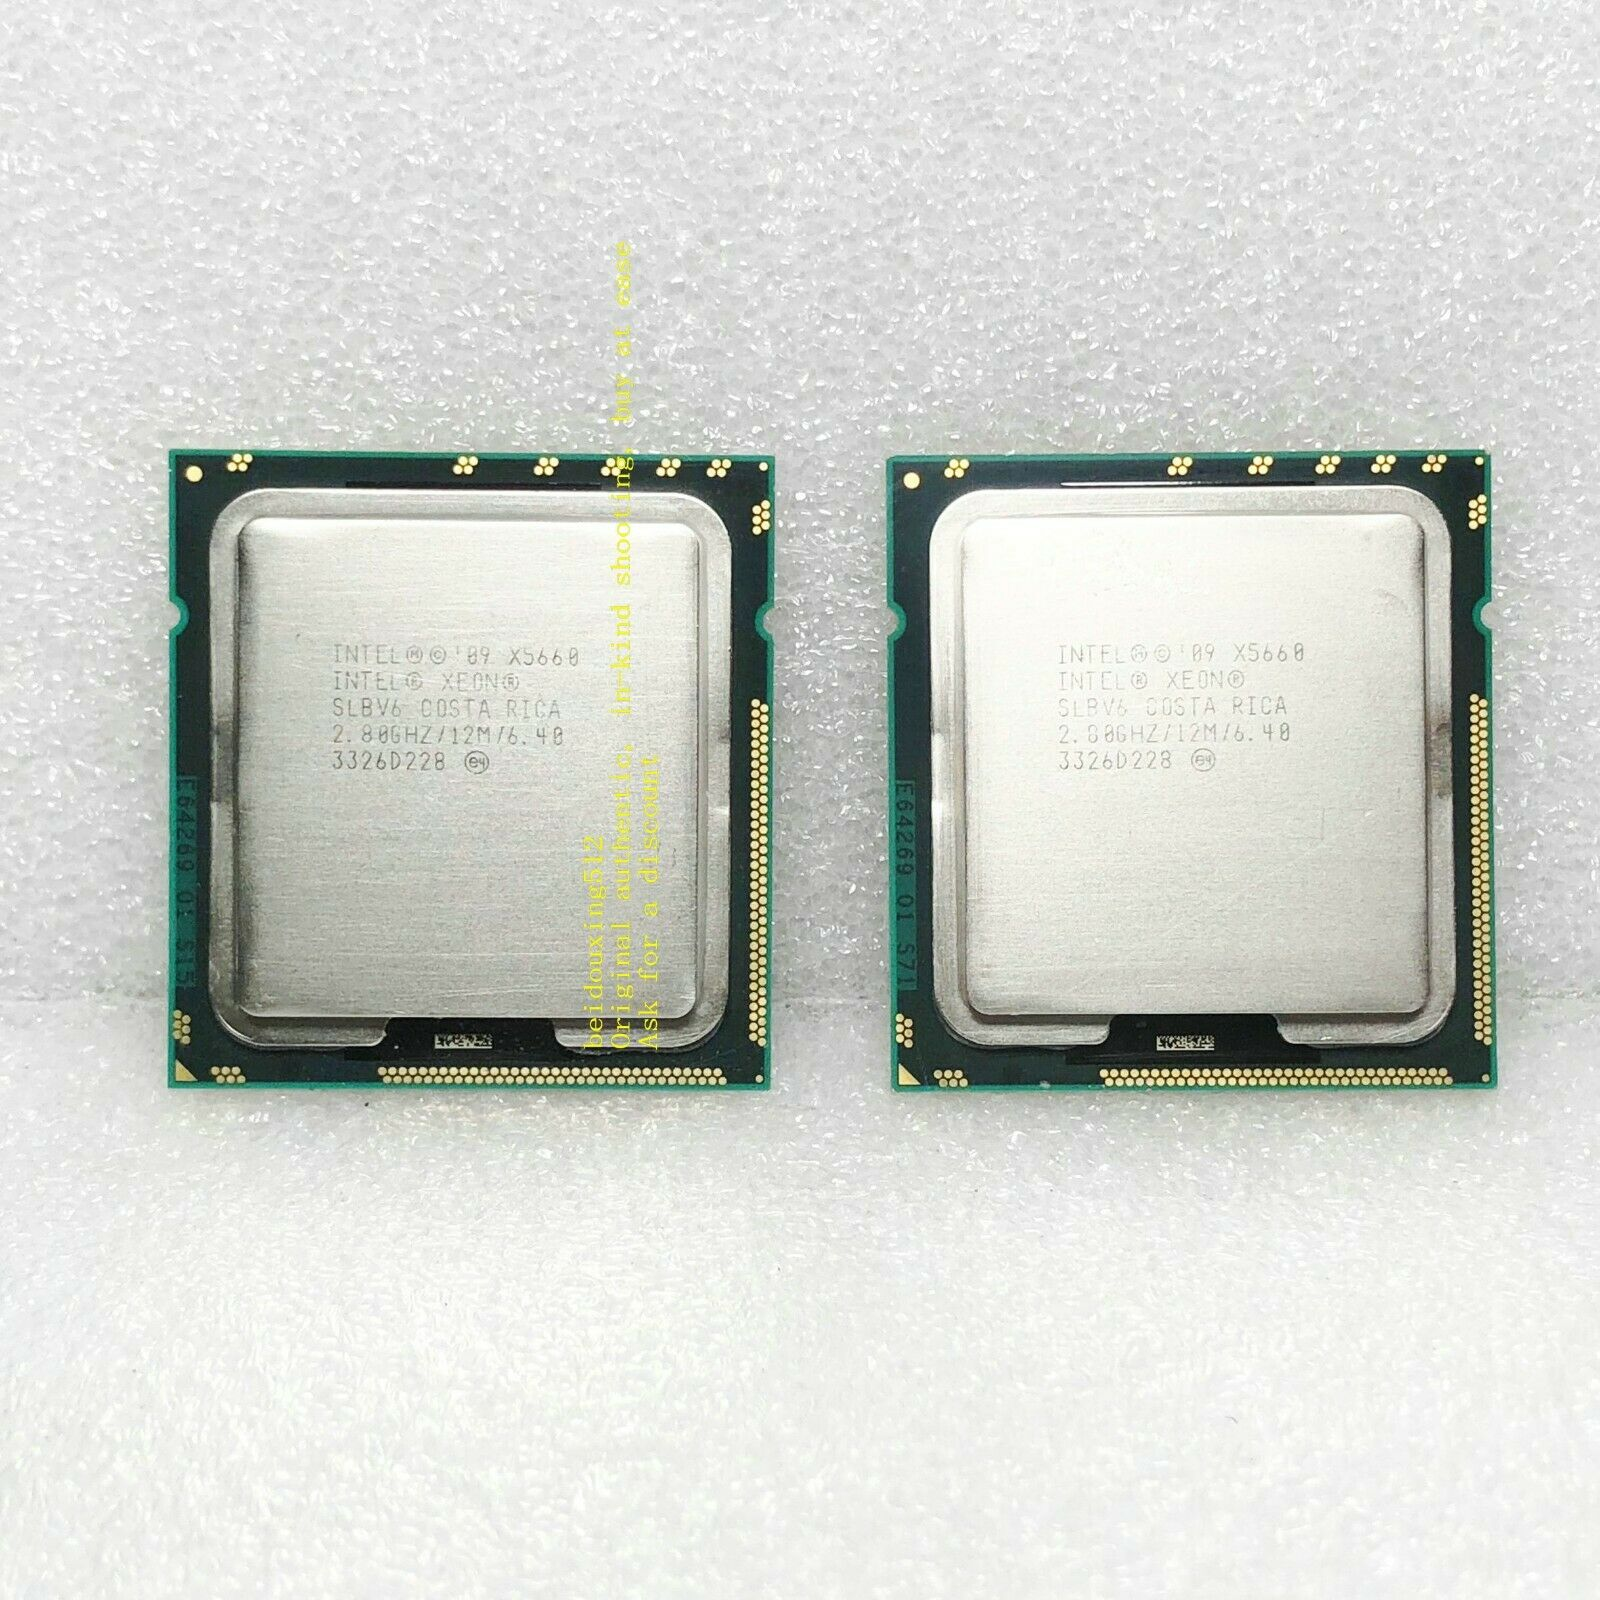 Intel Xeon X5660 2 8GHz Six Core (BX80614X5660) Processor